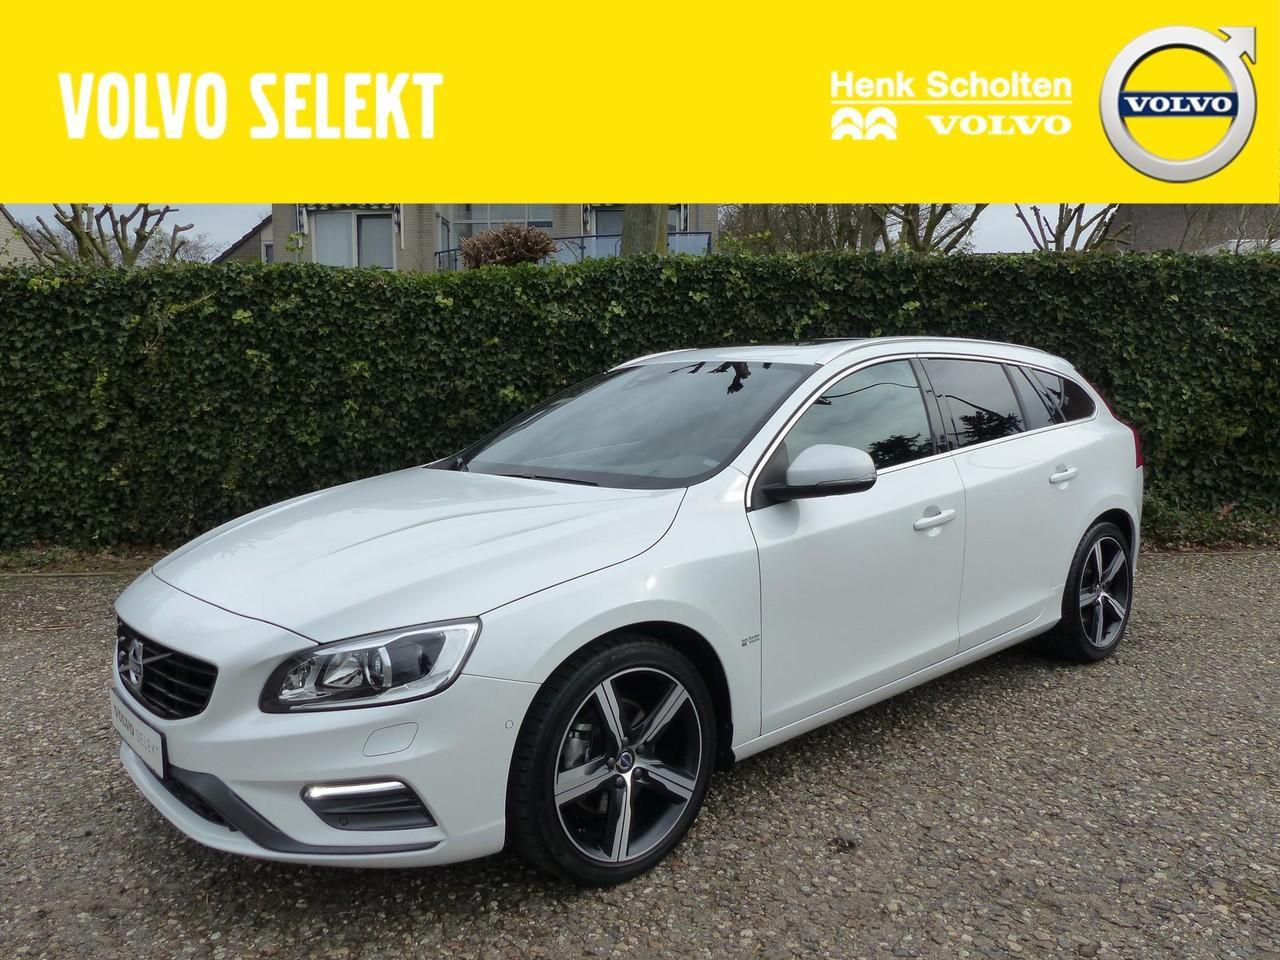 Volvo V60 D4 190pk gt business sport, luxury line, scandin